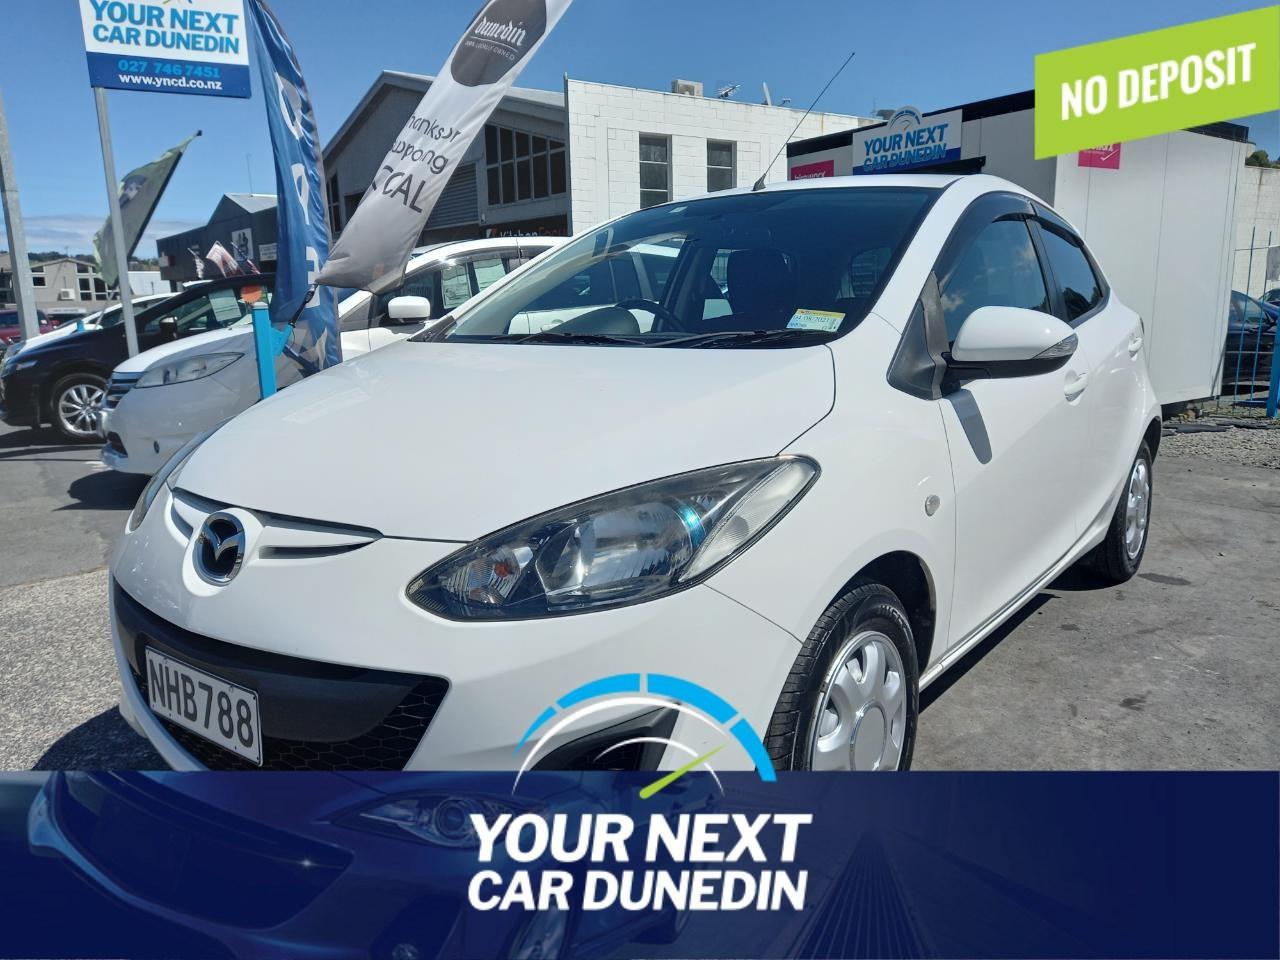 image-0, 2012 Mazda Demio No Deposit Finance at Dunedin